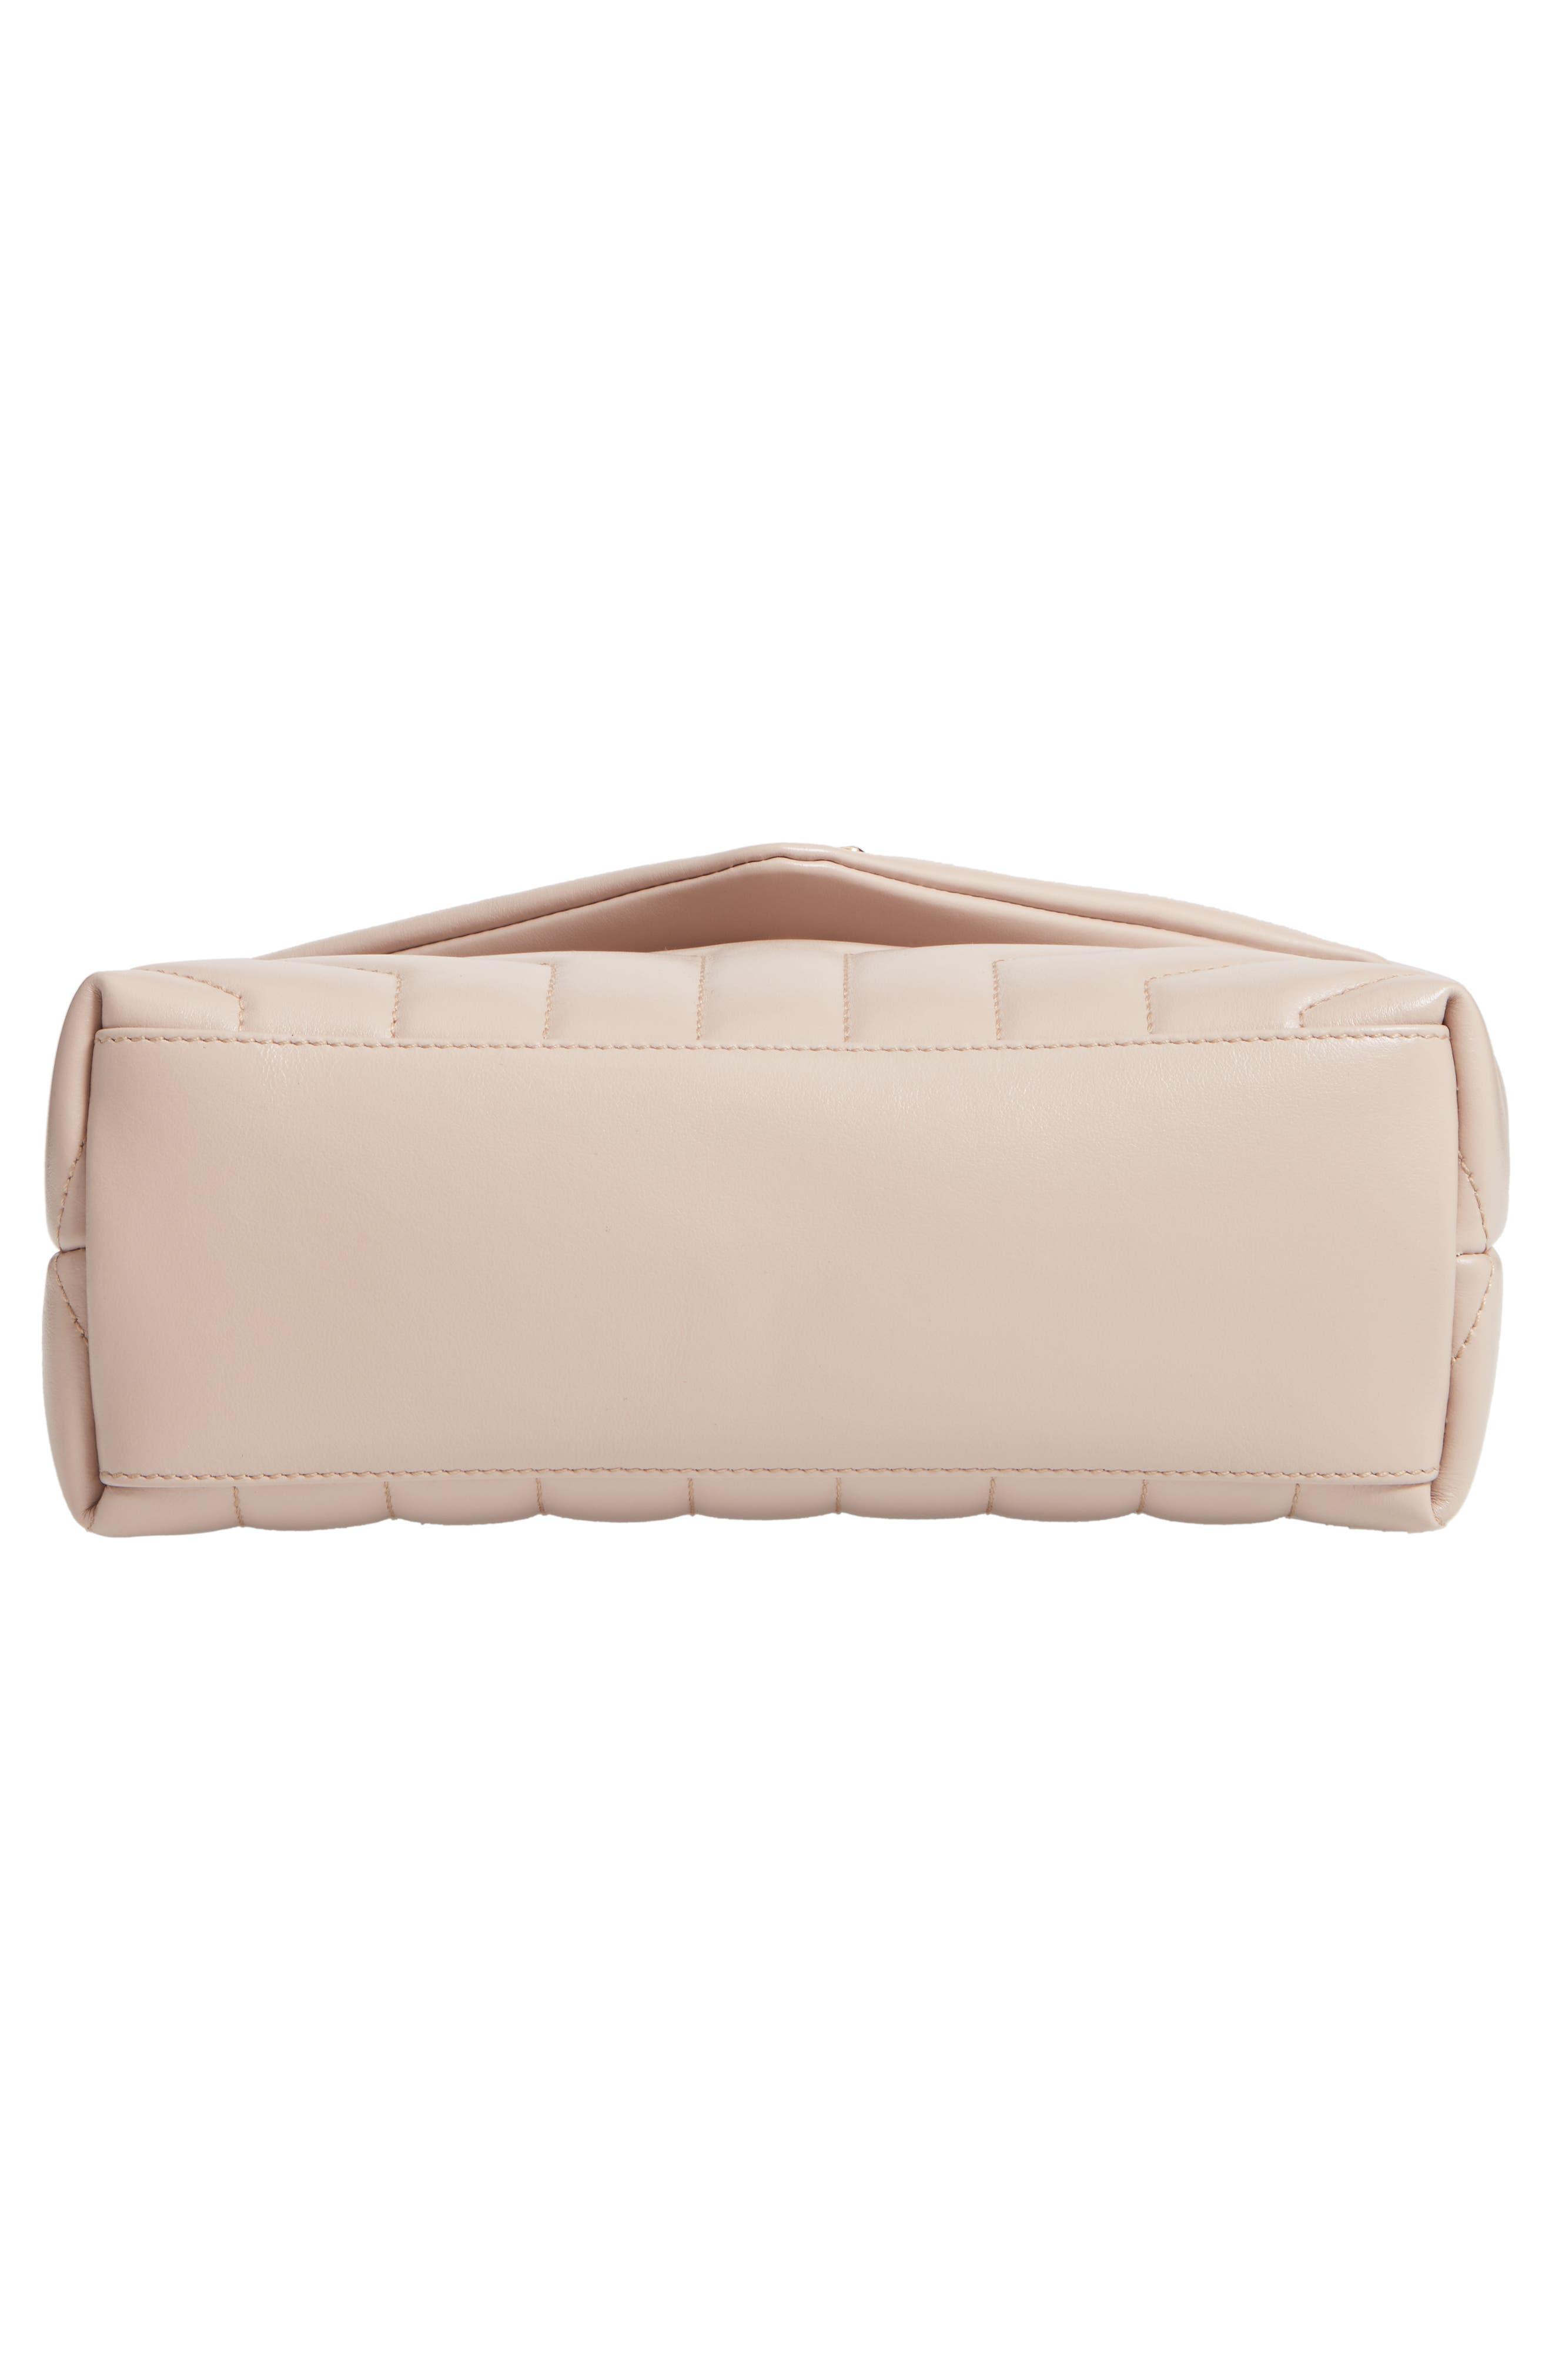 ,                             Small Loulou Leather Shoulder Bag,                             Alternate thumbnail 11, color,                             250